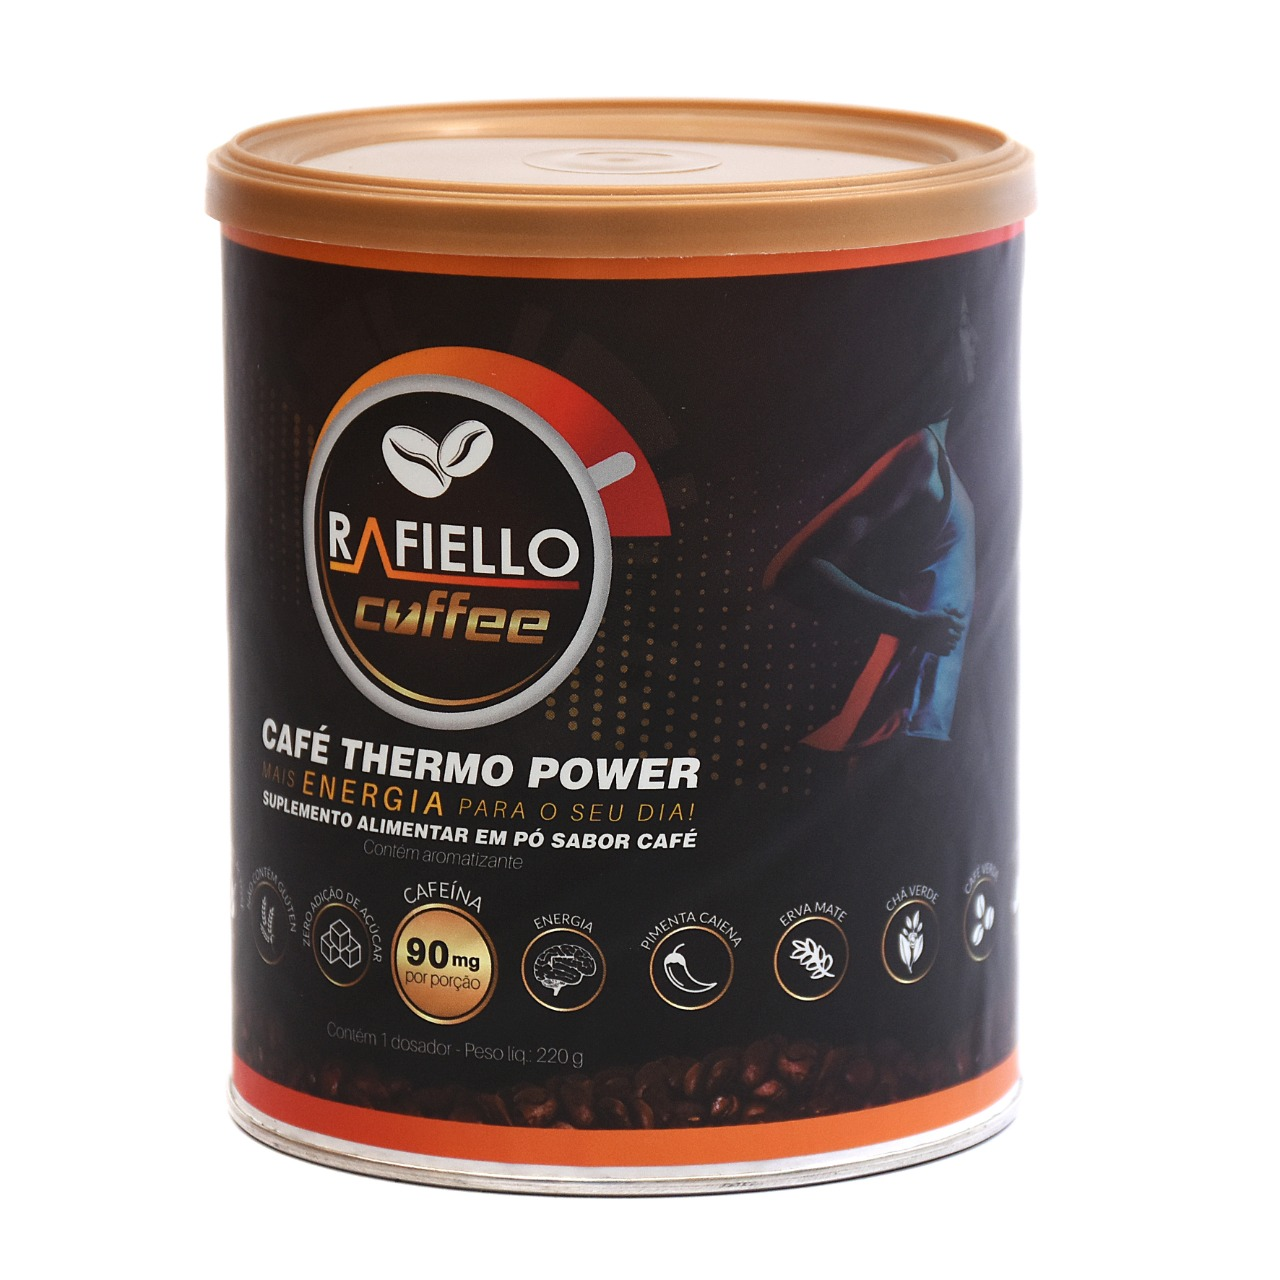 2 x Café Termogênico Vegano Funcional Pré Treino  Rafiello Coffee  S/glútem Zero Lactose 220g Kit 2 unidades + 2 xícaras de 330ml